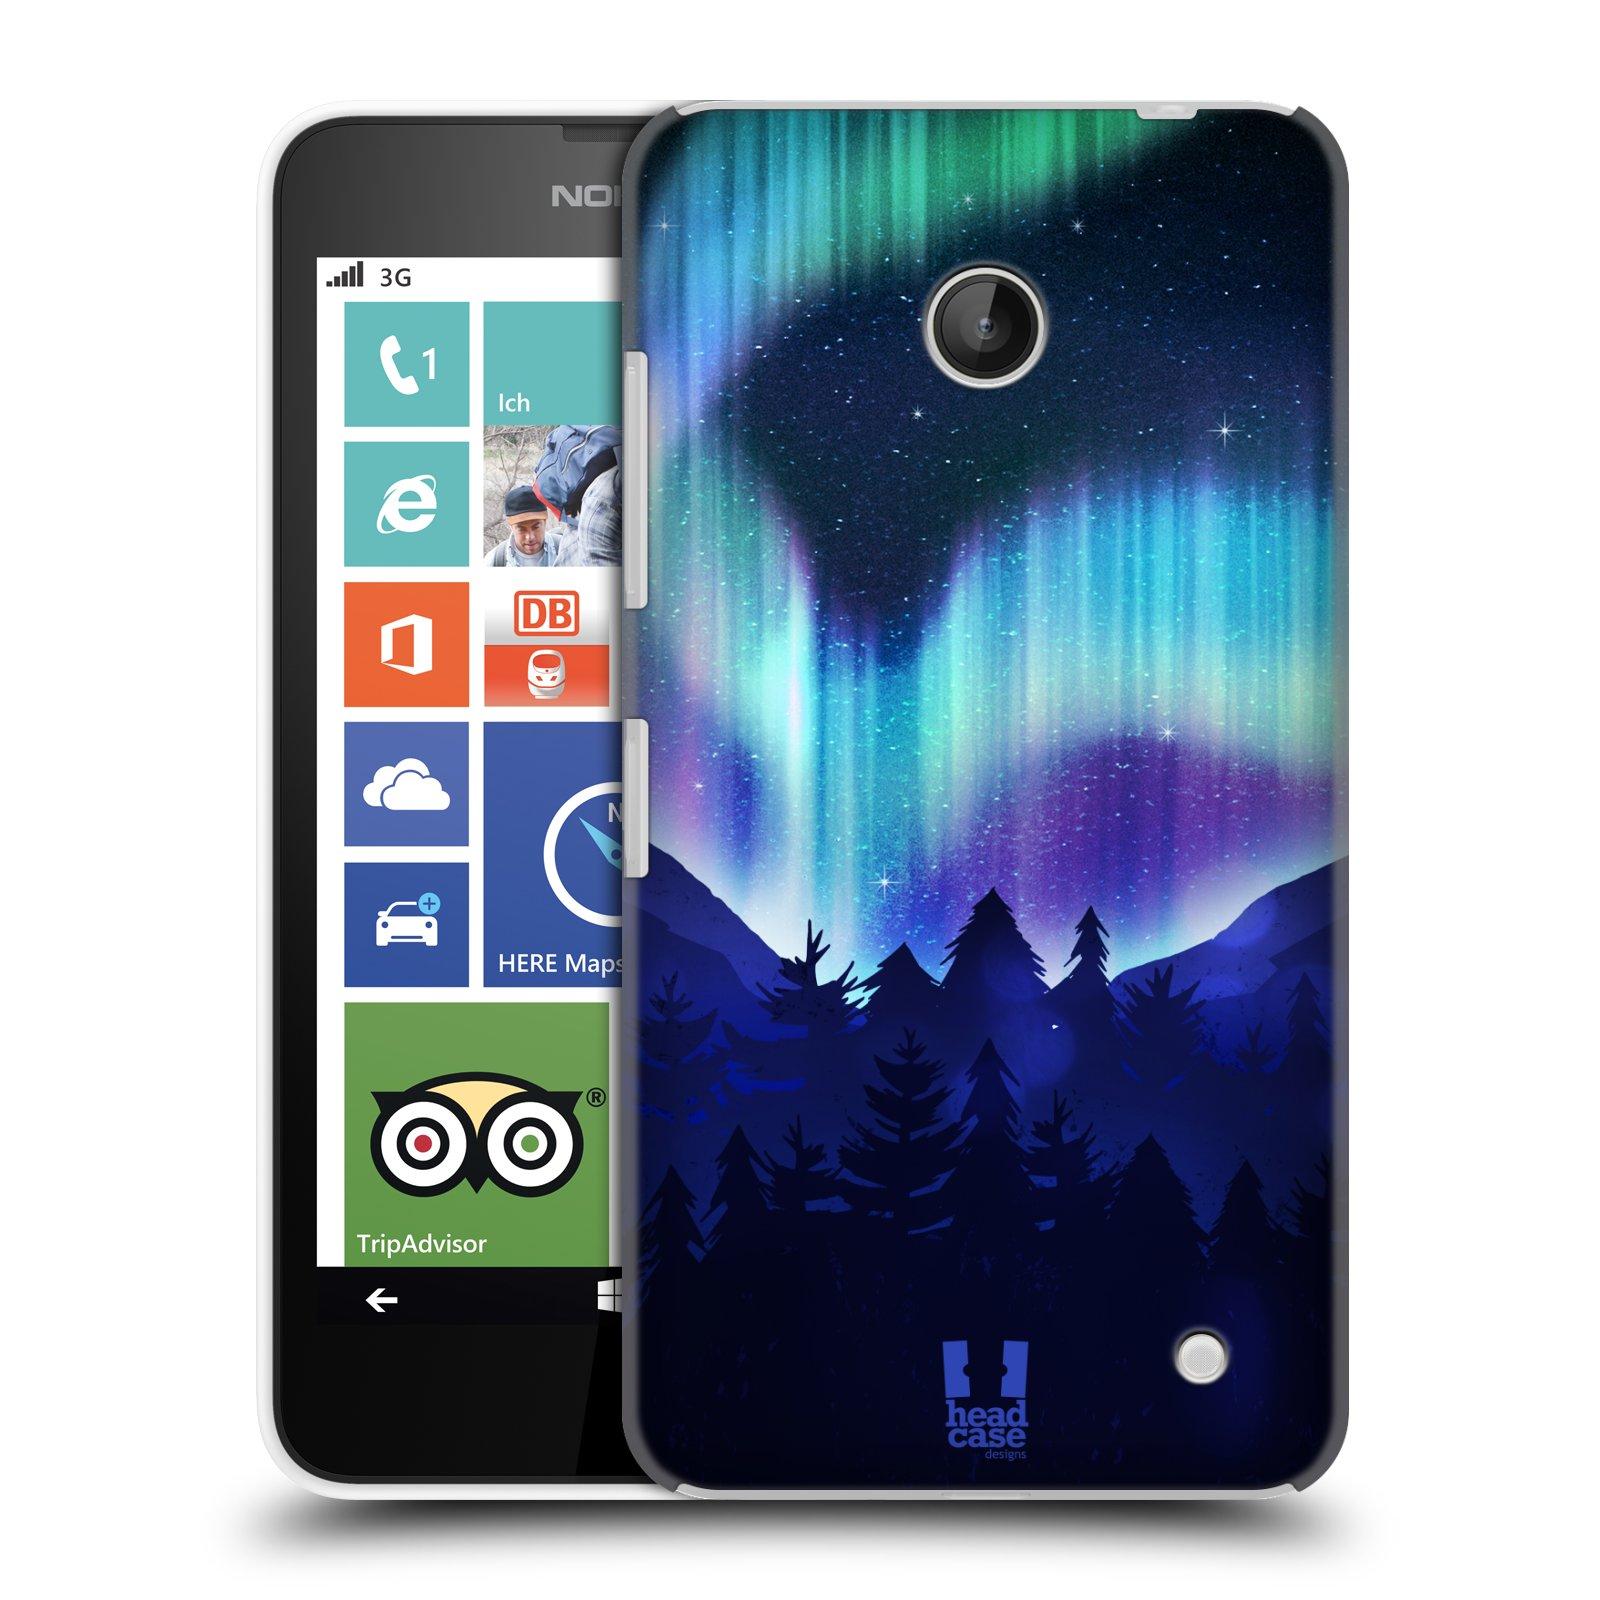 Plastové pouzdro na mobil Nokia Lumia 630 HEAD CASE Polární Záře Borovice (Kryt či obal na mobilní telefon Nokia Lumia 630 a Nokia Lumia 630 Dual SIM)